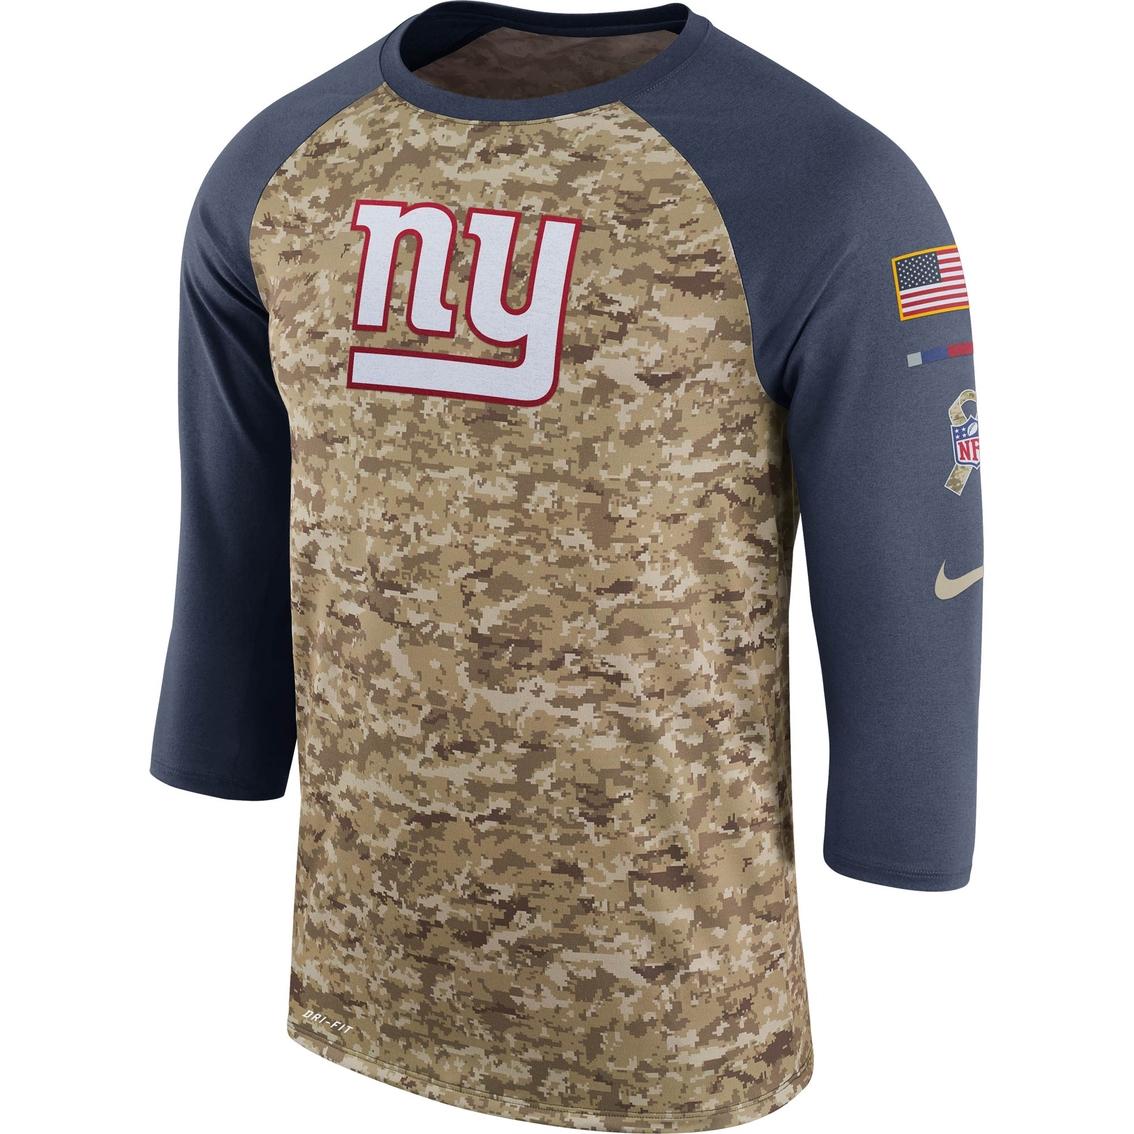 Nike Nfl New York Giants Salute To Service Raglan Tee  fd5fd1eaf